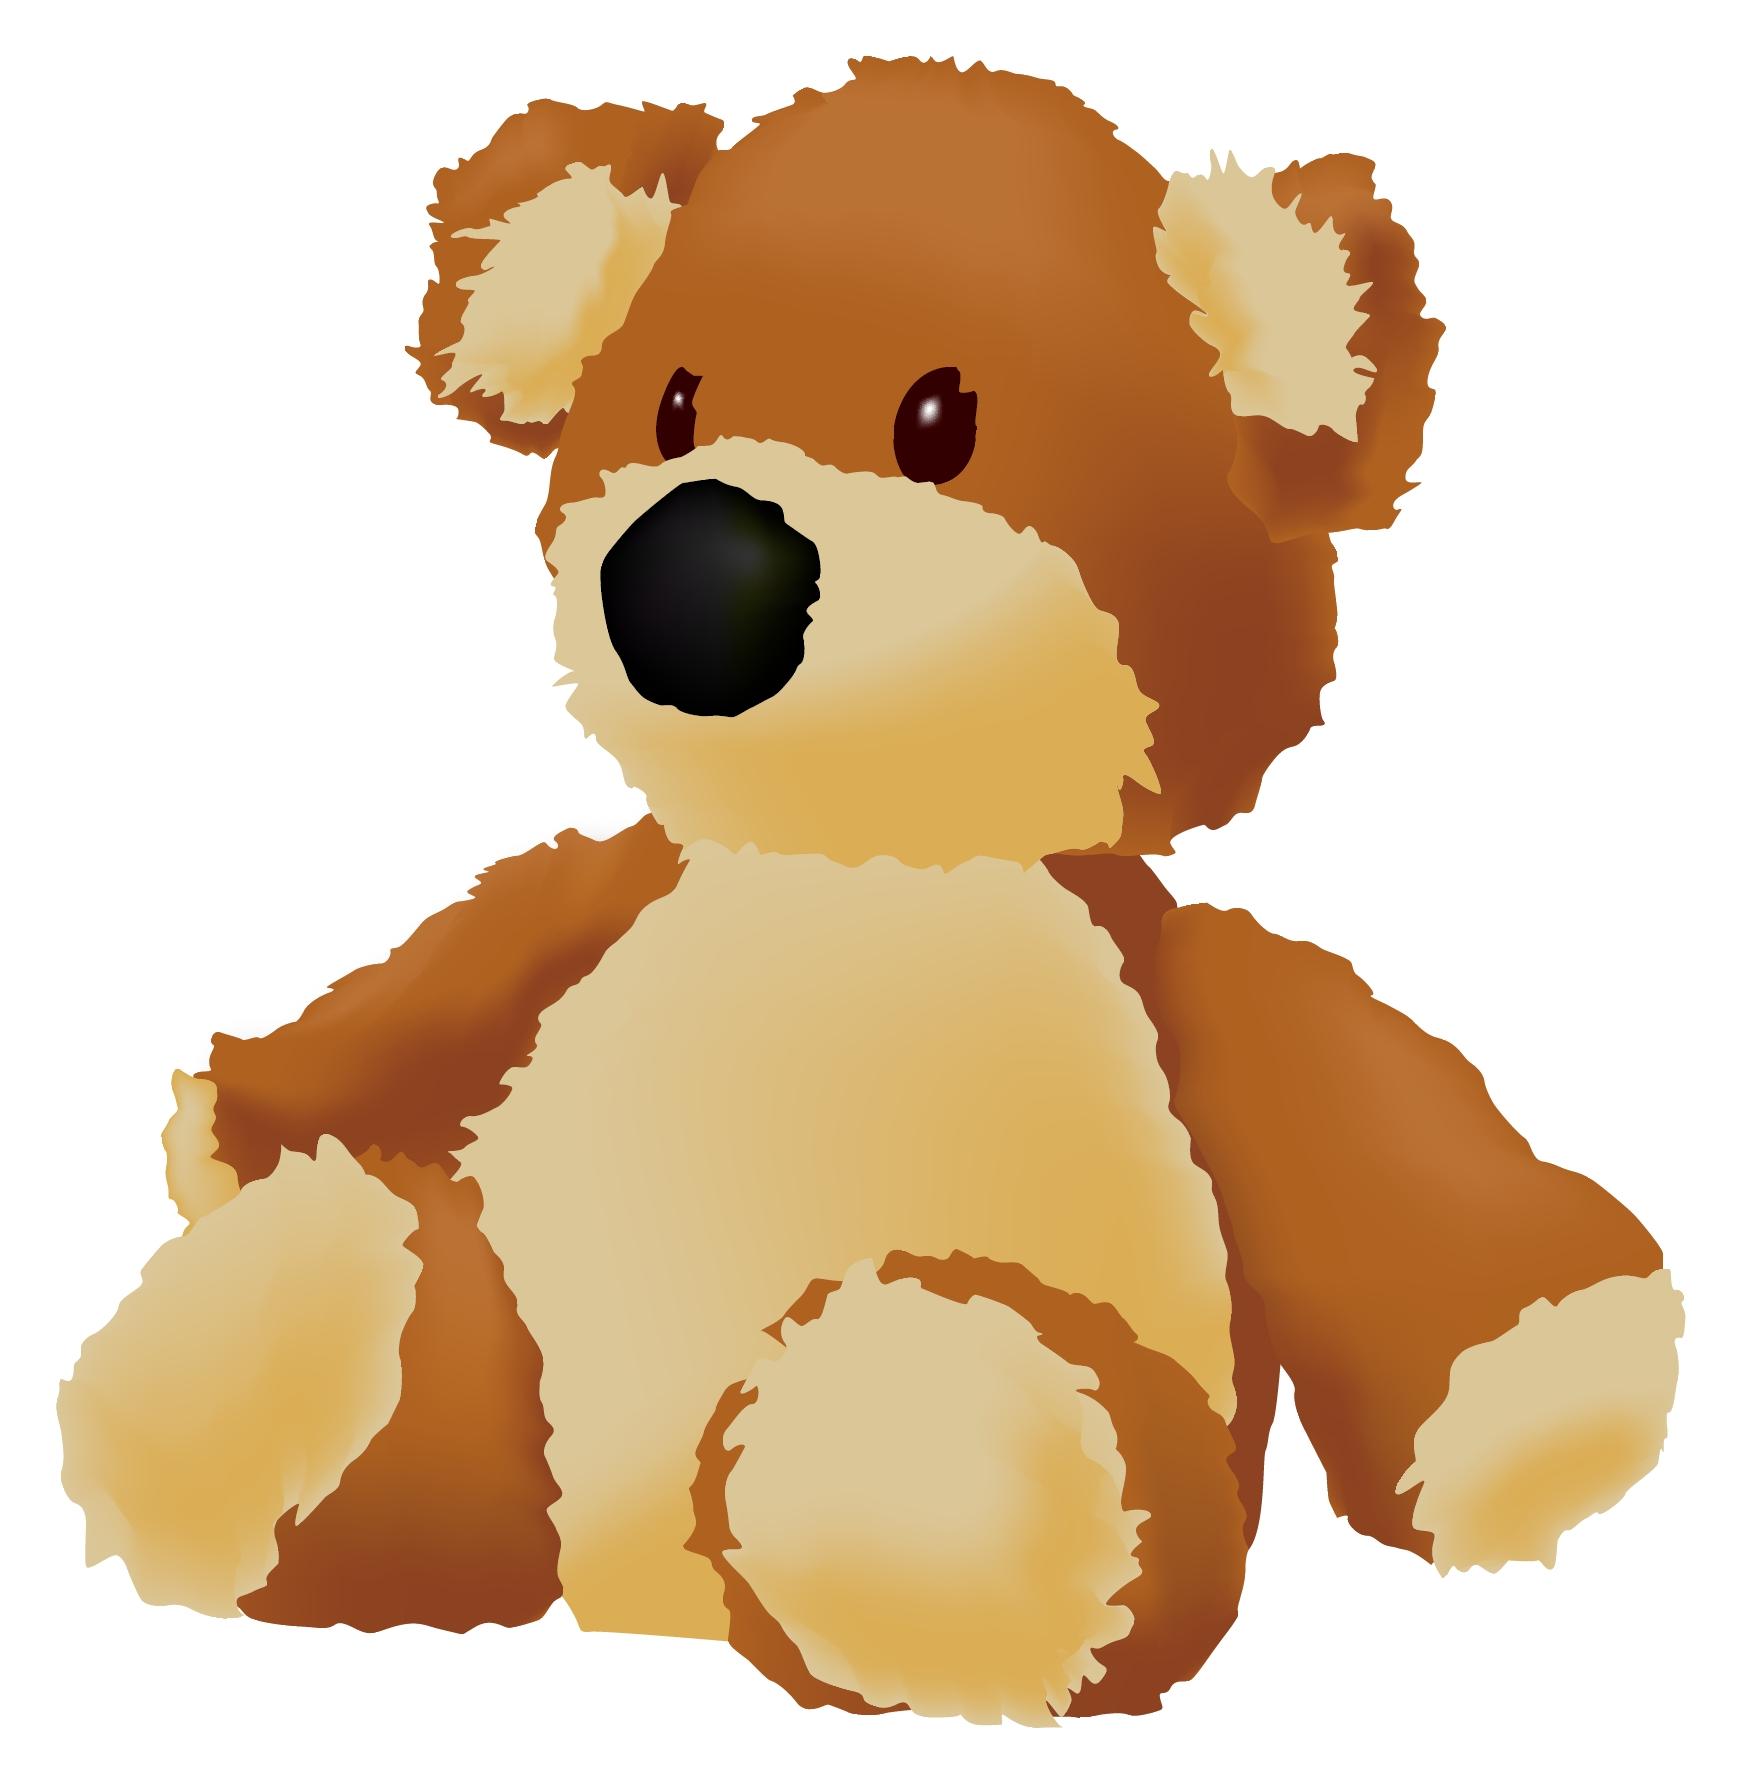 Shhh teddy bear clipart clip transparent library Free Bear Preschool Cliparts, Download Free Clip Art, Free ... clip transparent library